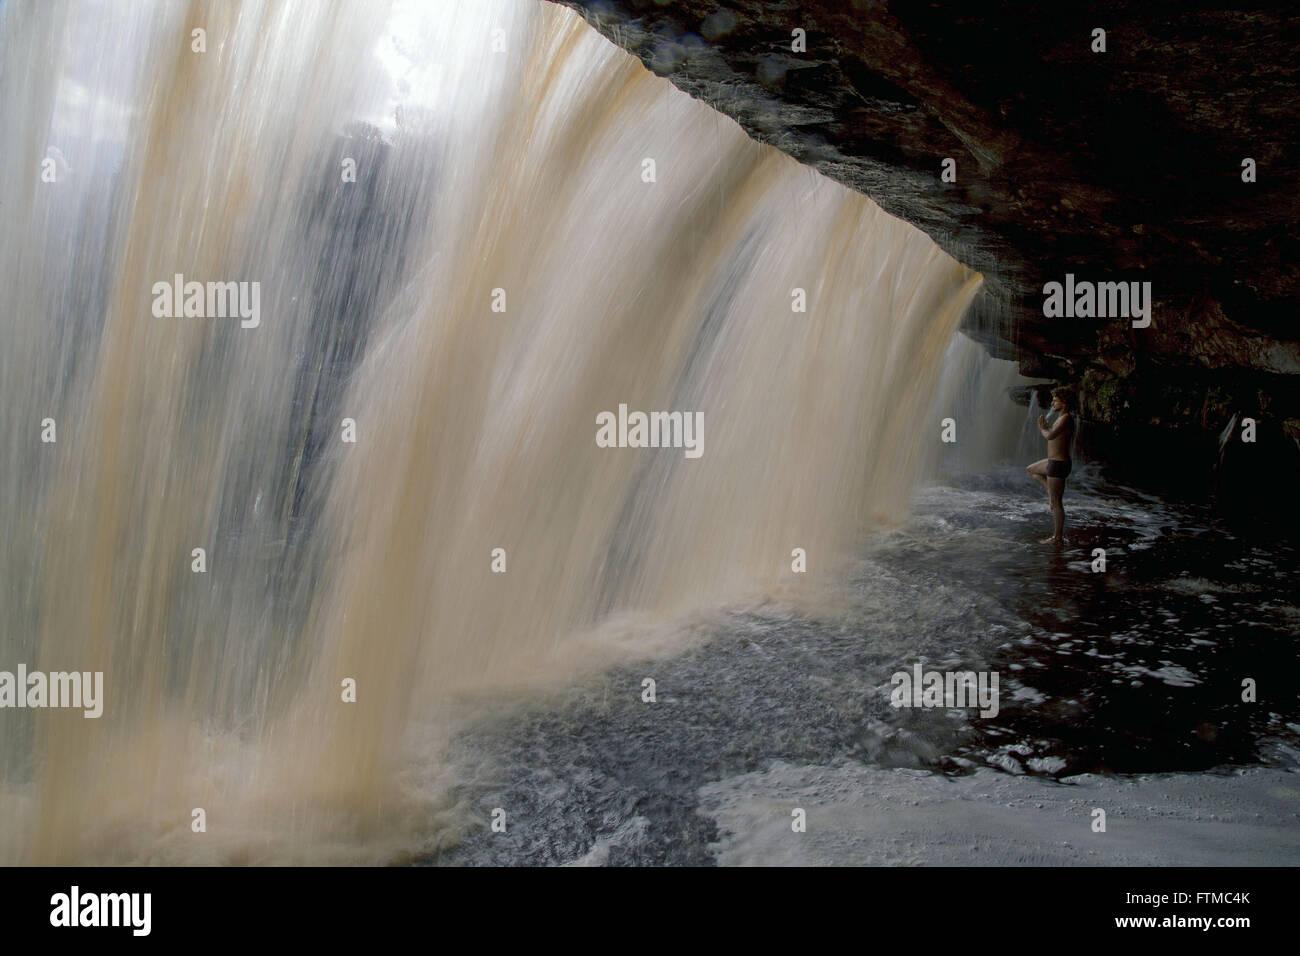 Ecotourist in Waterfall Fumacinha - Stock Image